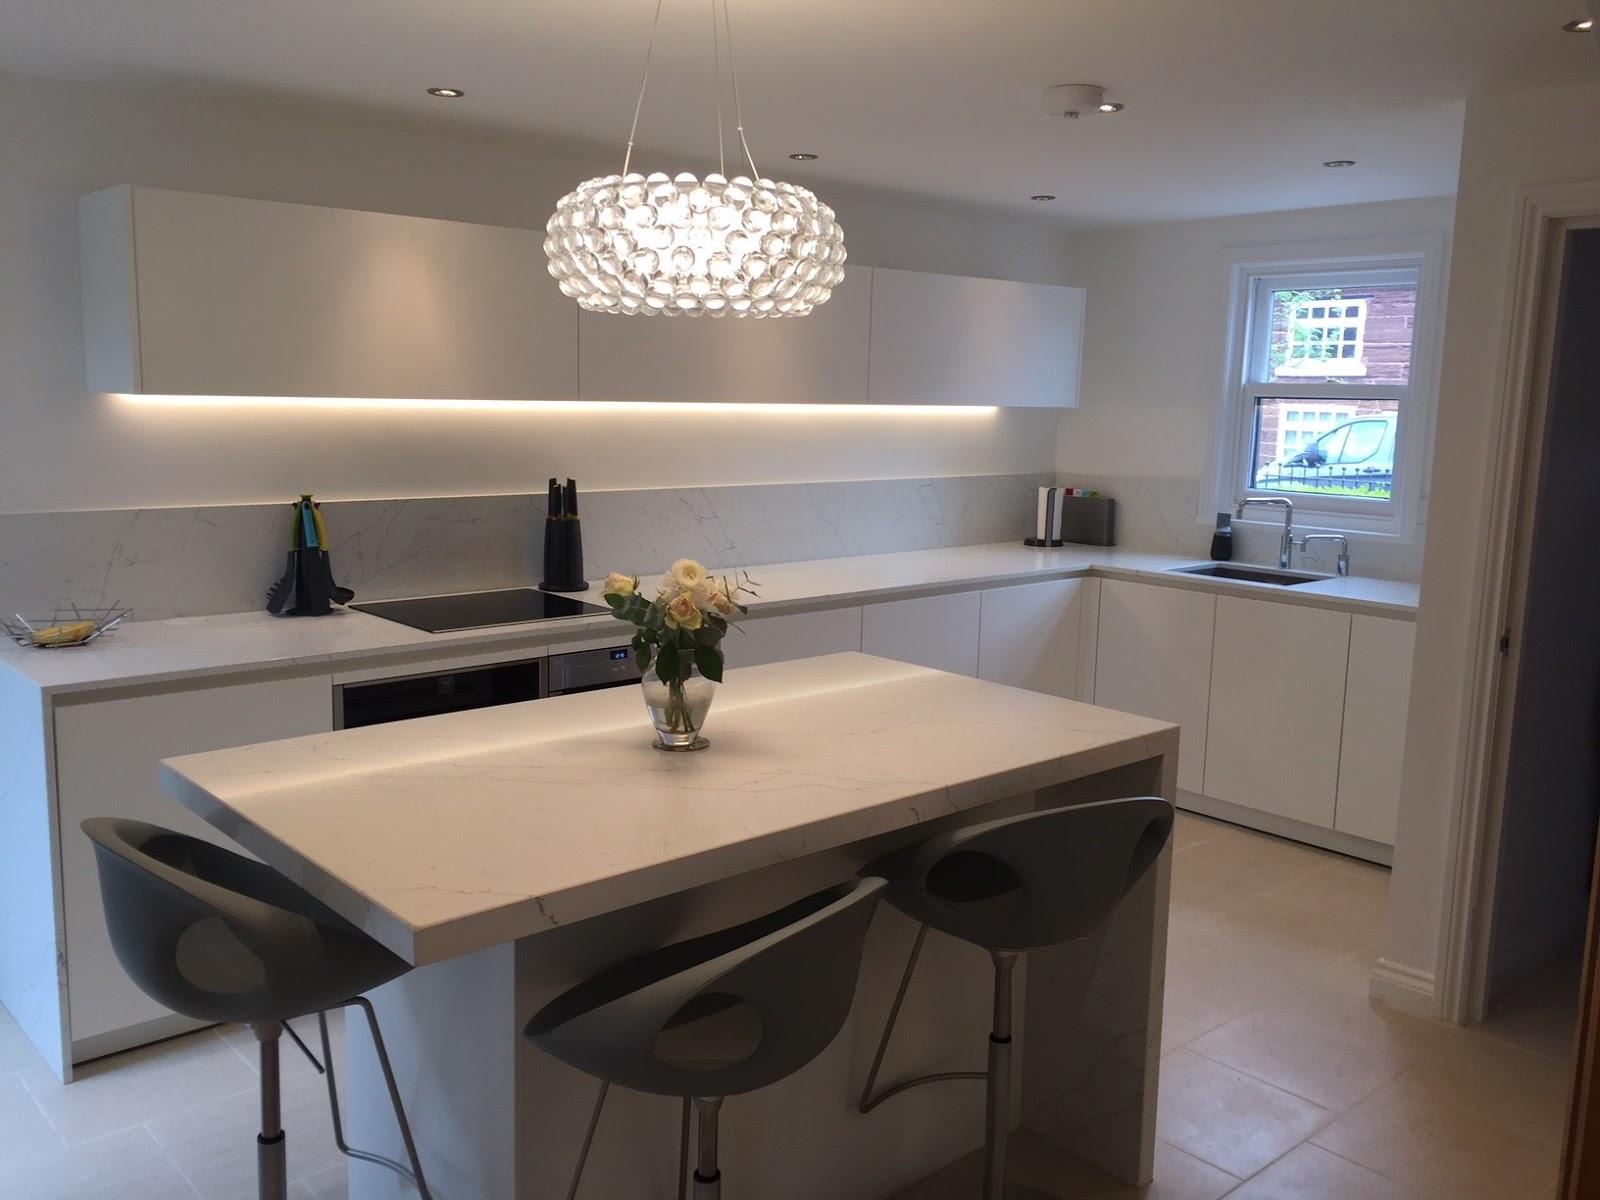 Mr And Mrs Smith Kitchen diane berry kitchens - client kitchens: mr and mrs smith